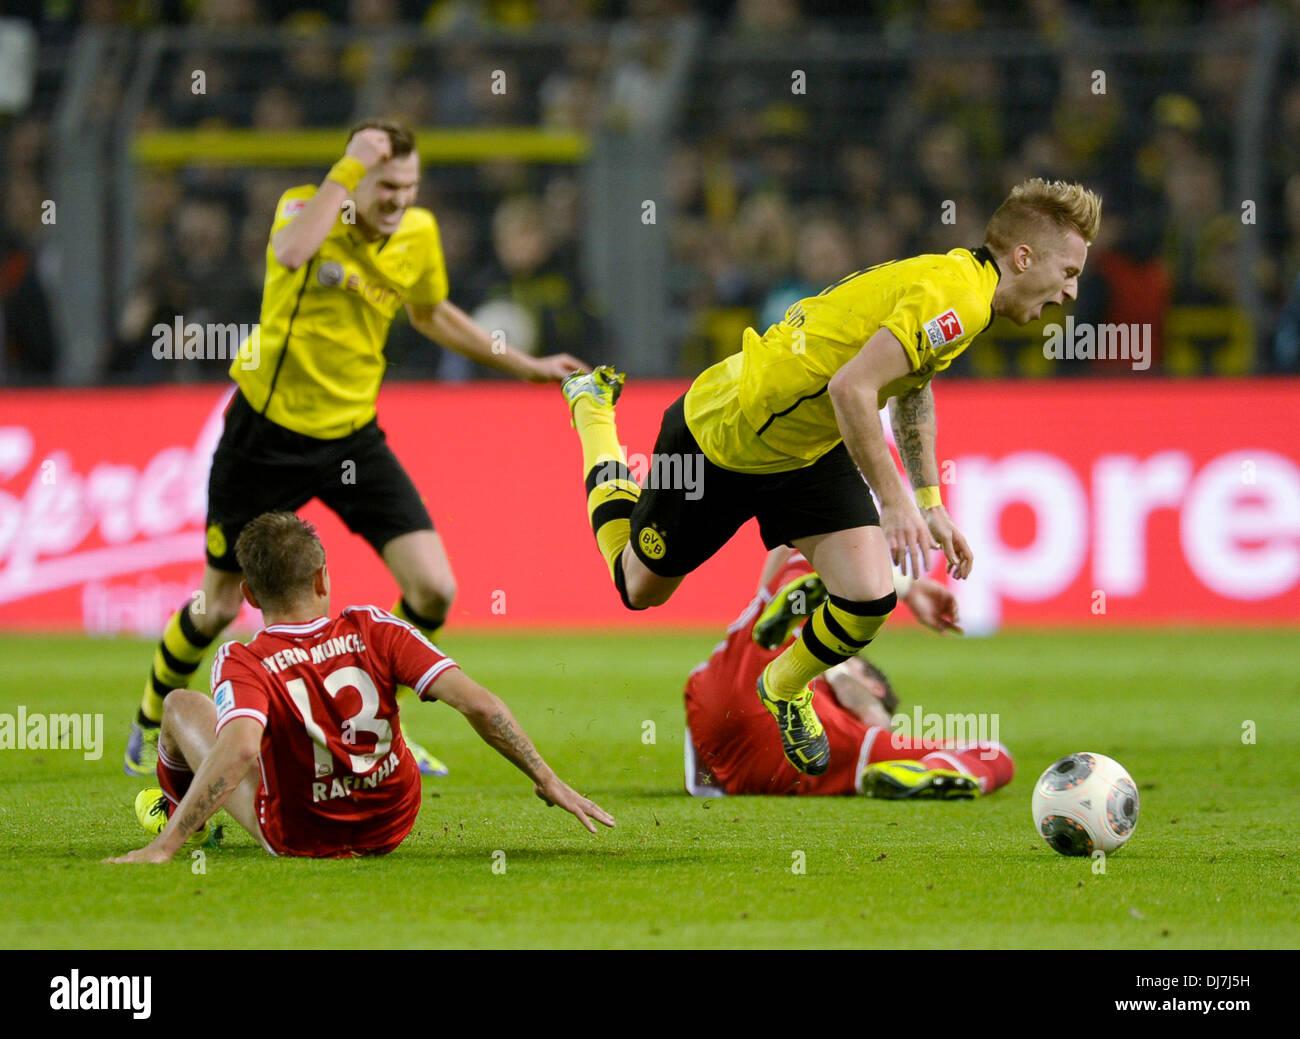 Dortmund, Germany November 23rd 2013, German Football Bundesliga Season 2013/14 matchday 13, Borussia Dortmund (BVB) vs. FC Bayern Munich (Muenchen, Munchen, FCB) 3:0 --- Rafinha (Bayern Muenchen) fouls Marco Reus (BVB) - Stock Image